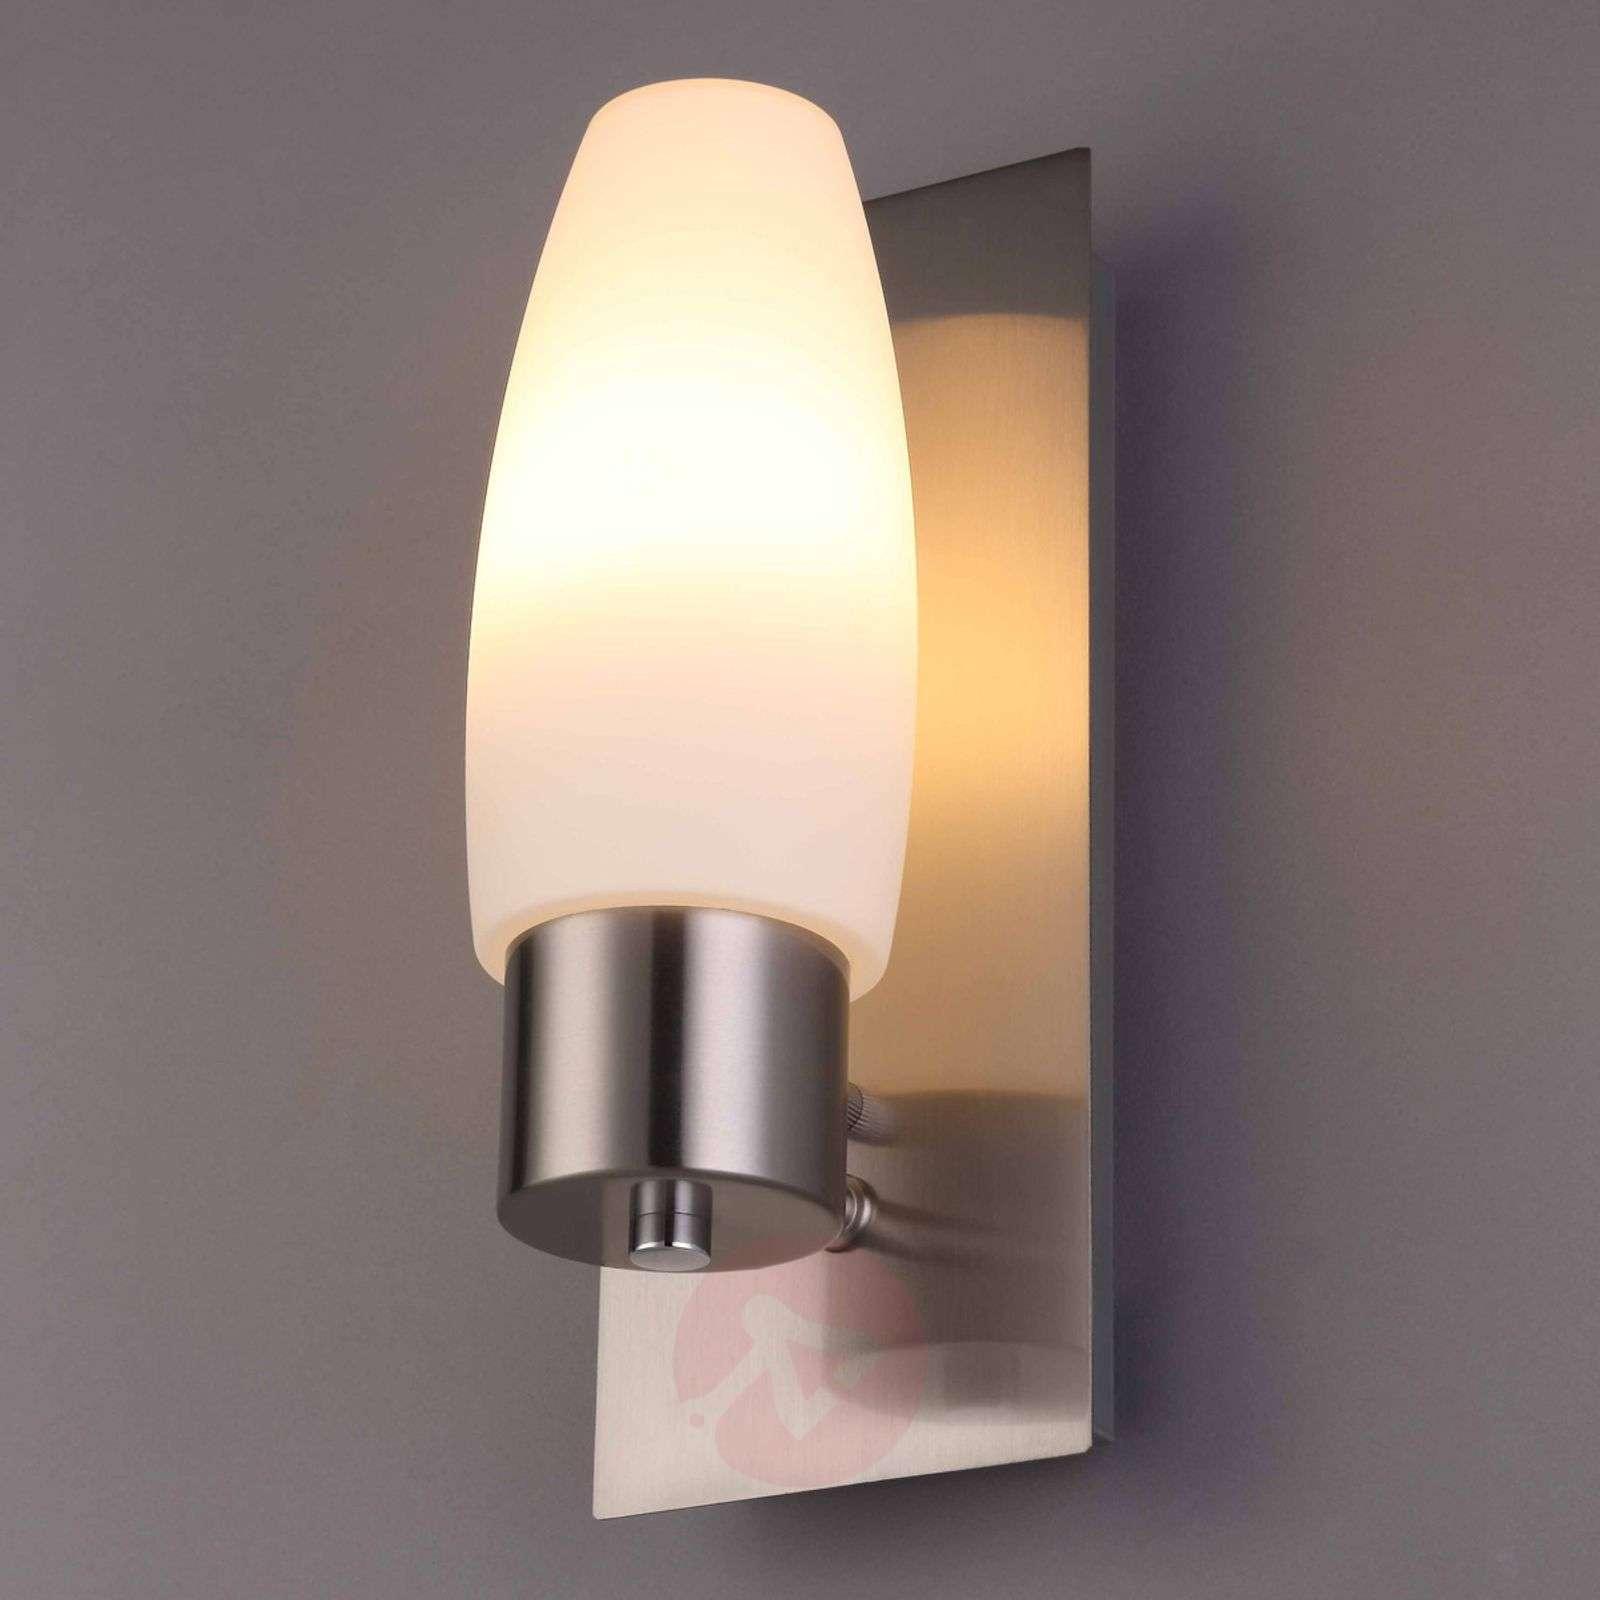 savoy wall p bathroom light sn satin sconce nickel in hagen house